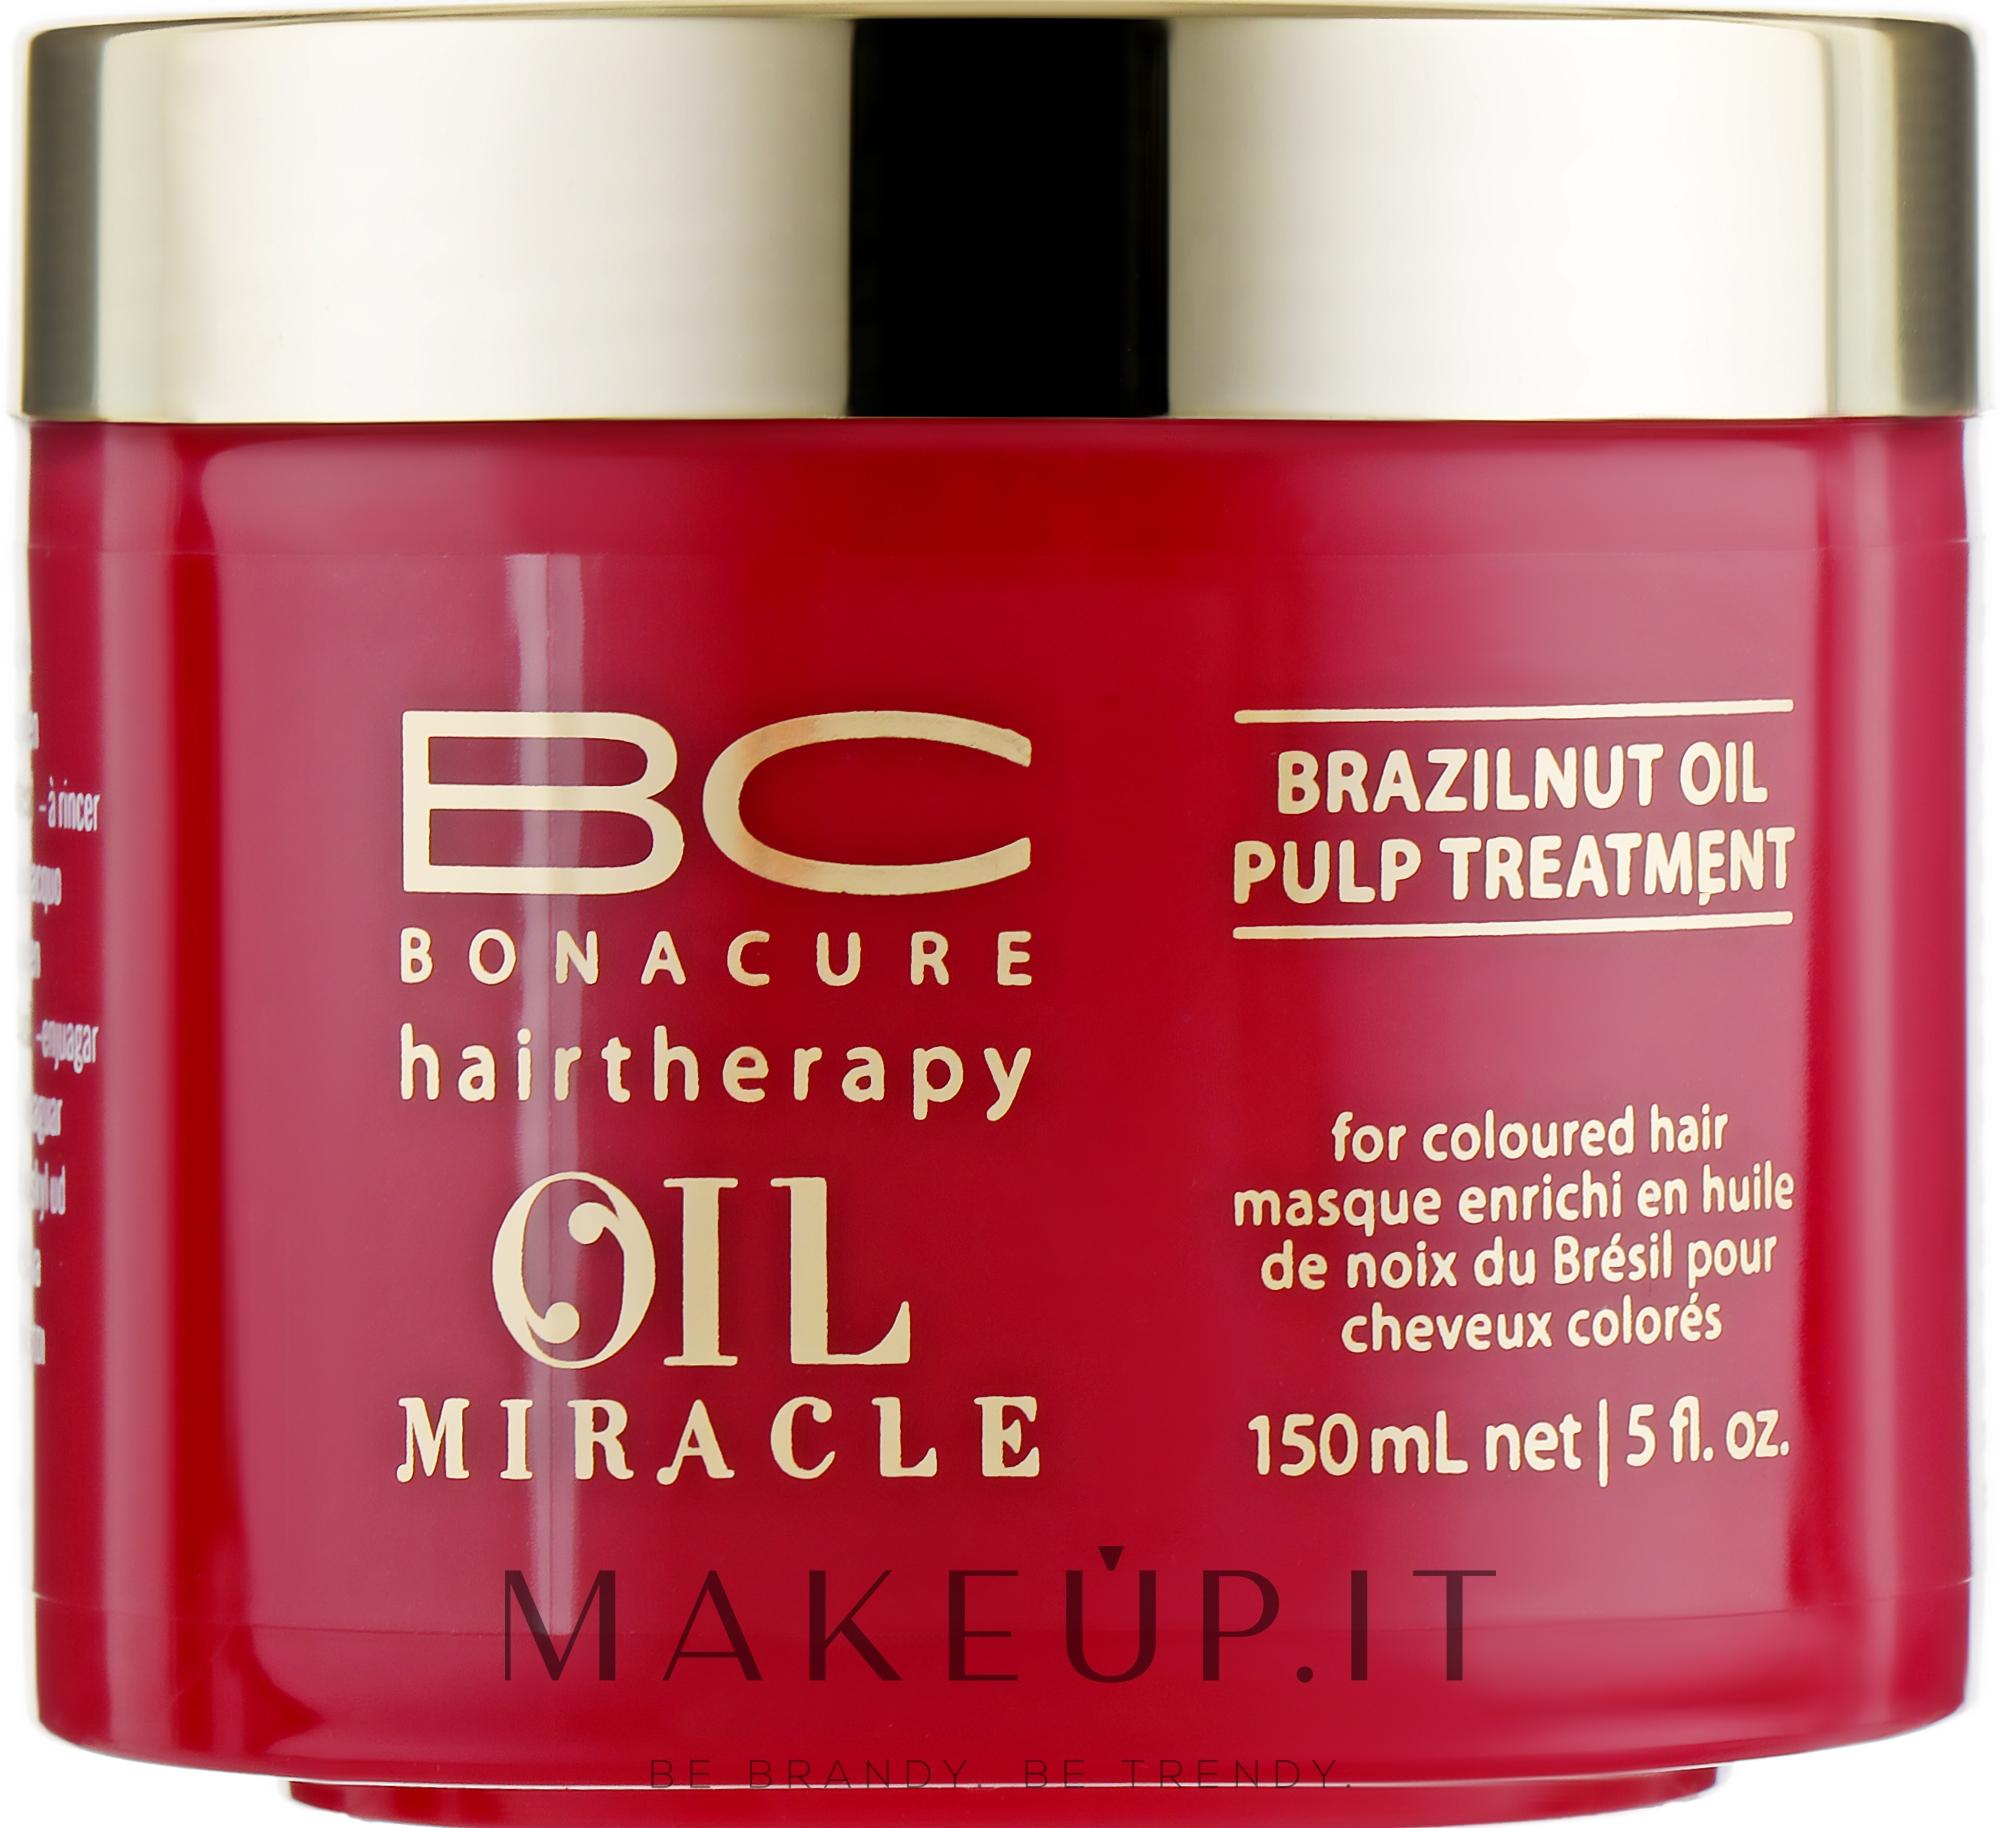 Maschera con olio di noce brasiliana - Schwarzkopf Professional Bonacure BC Miracle Brazilnut Oil Pulp Treatment — foto 150 ml